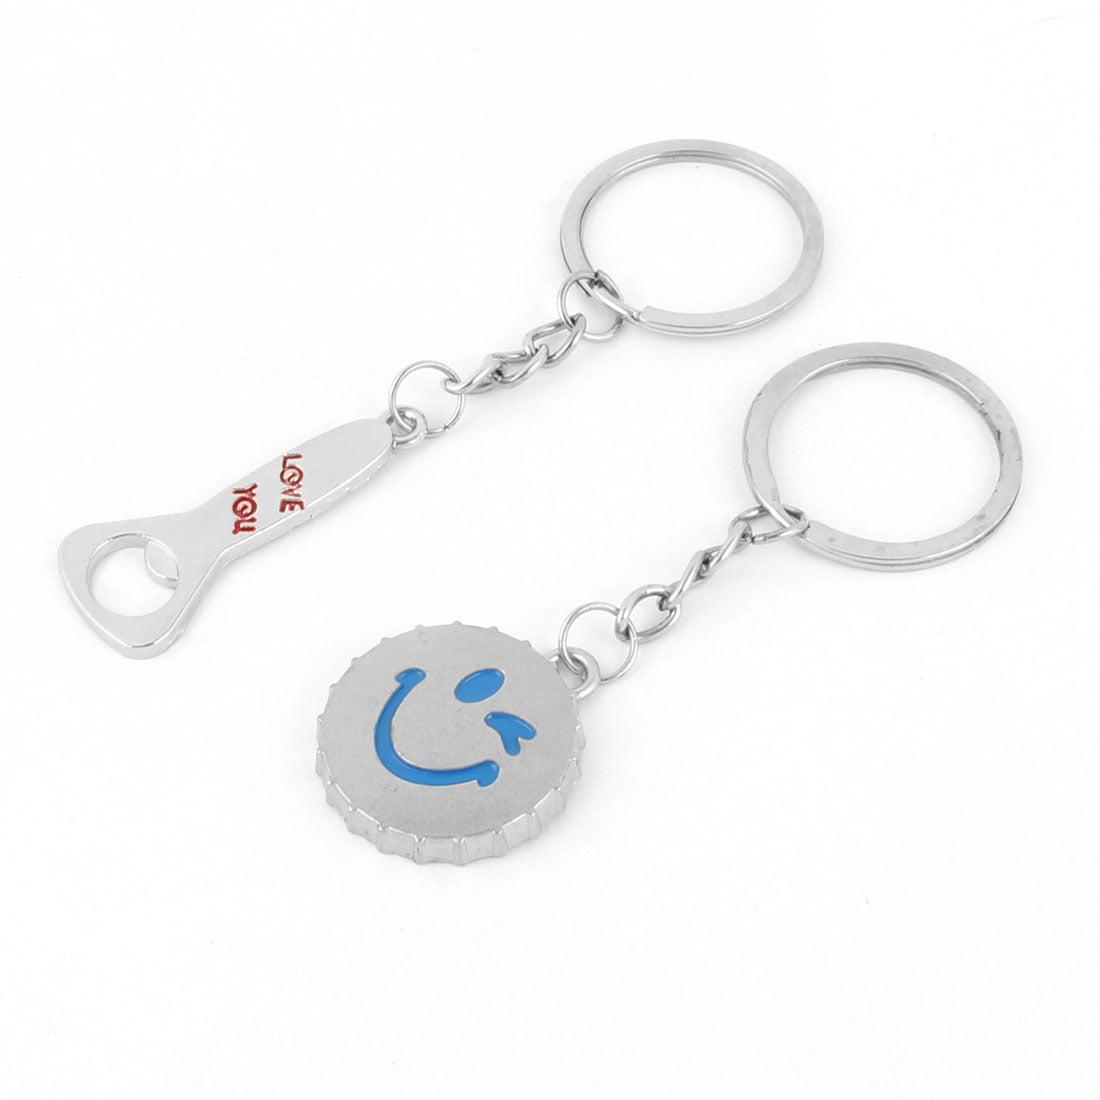 Metal Beer Cap Bottle Opener Shaped Pendant Couple Keychain Key Ring Holder Pair - image 3 of 3